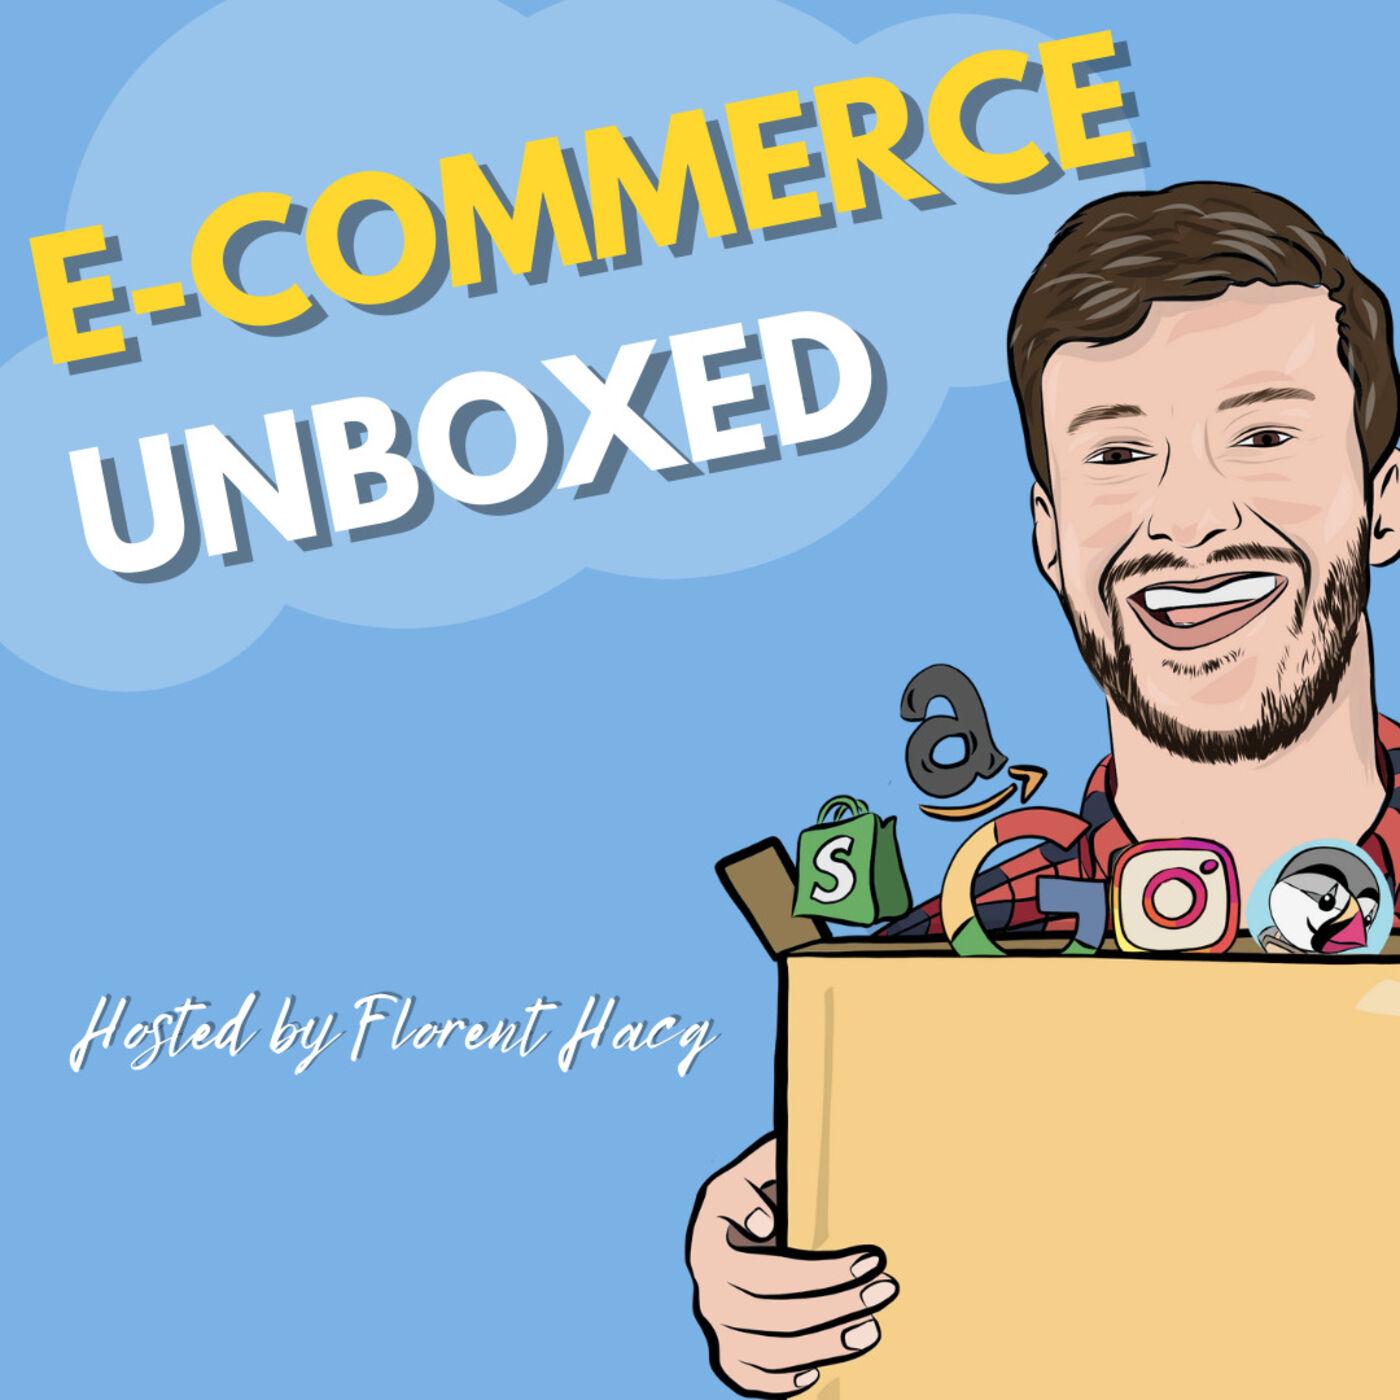 E-commerce Unboxed